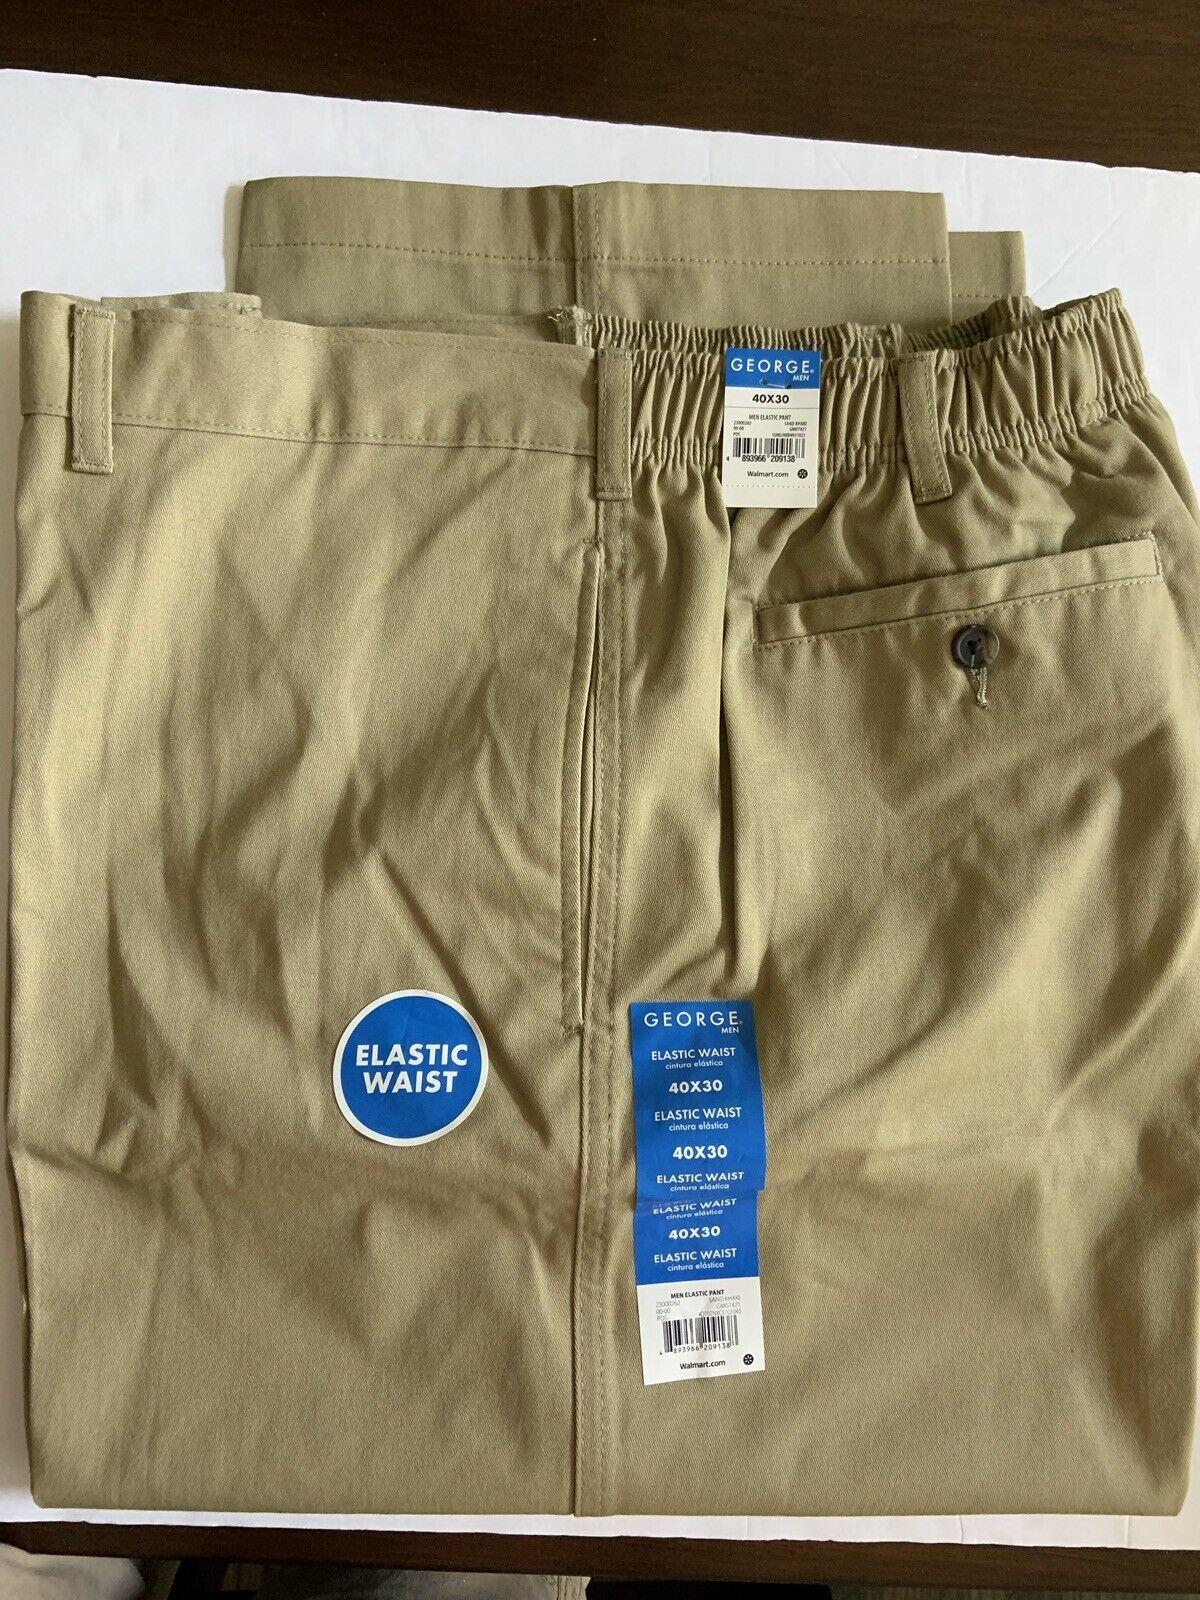 George Men's Flat Front Khakis Pant Elastic Waist Tan Various Sizes Waist 34-44